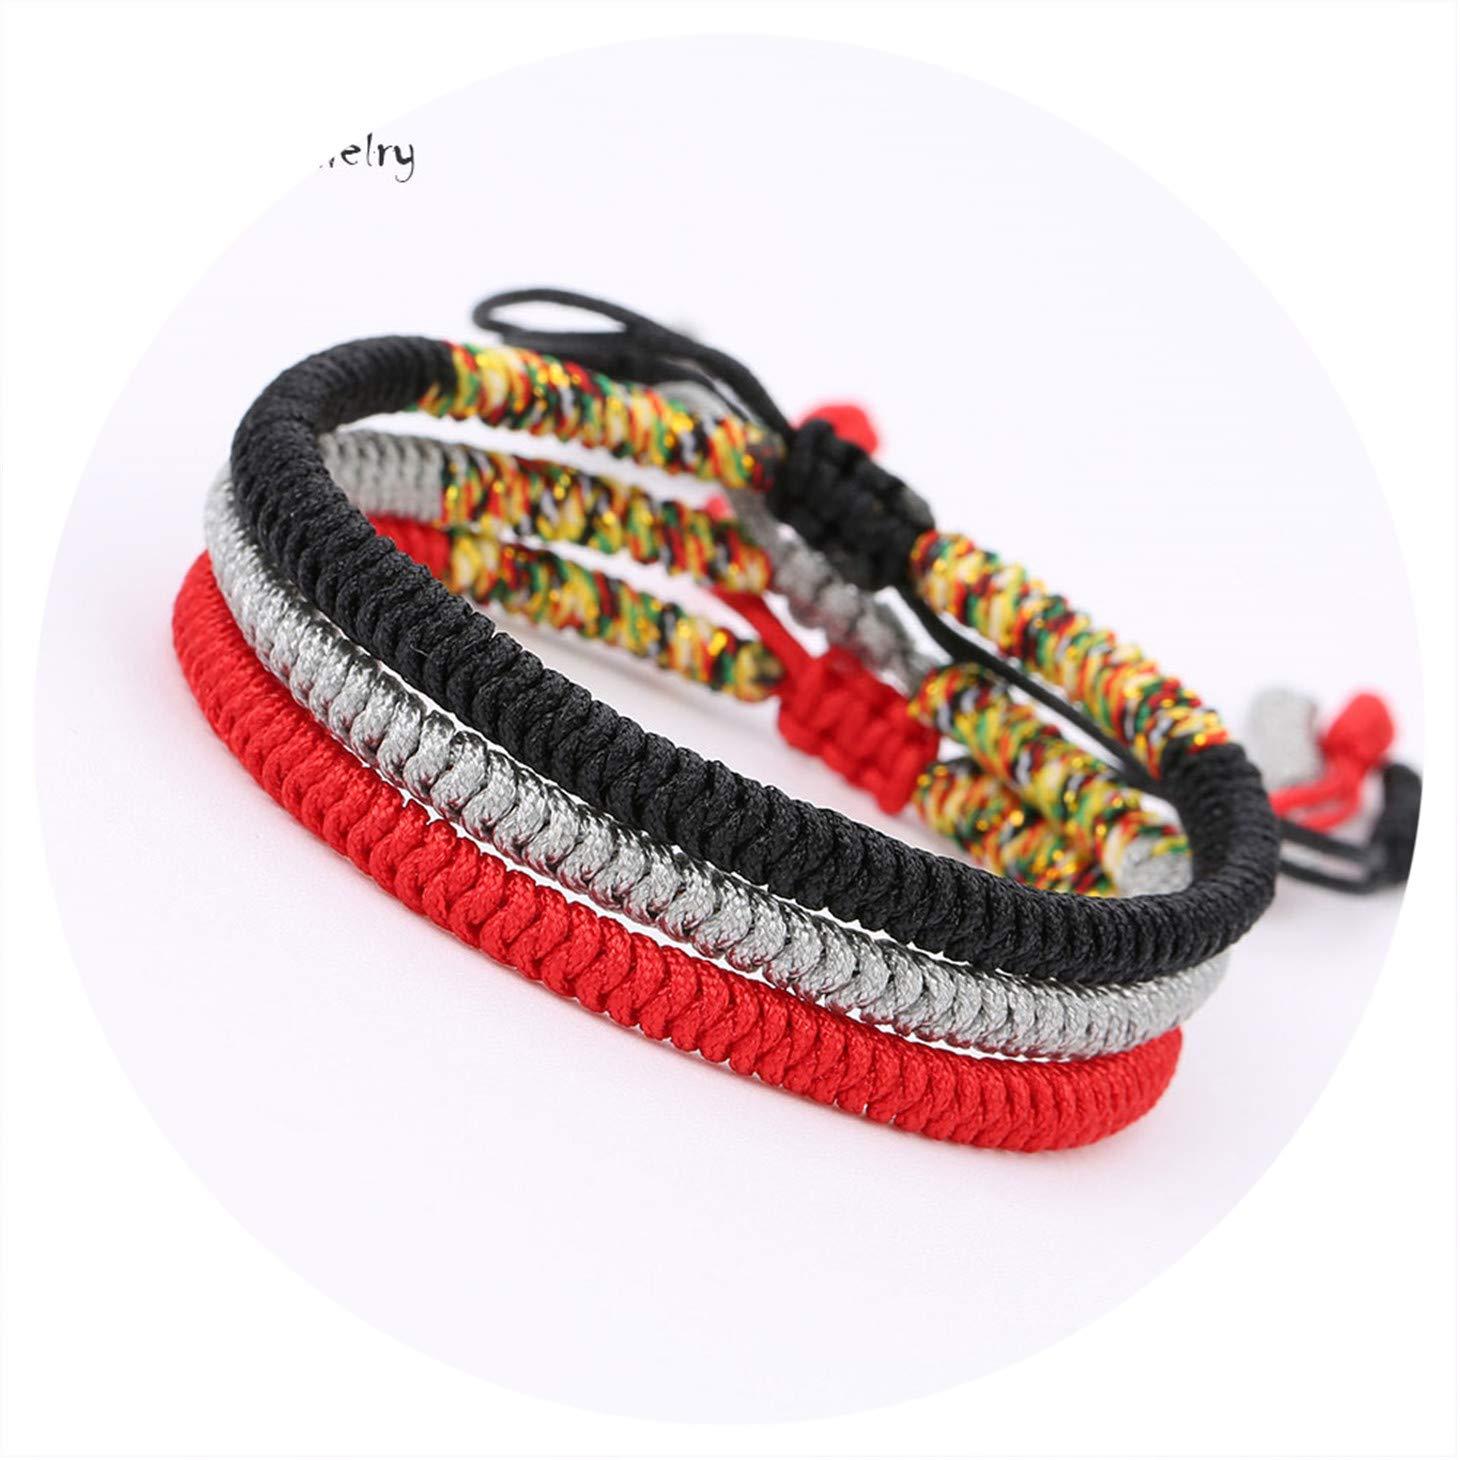 Olive Tayl 3PCS Multi Color Tibetan Buddhist Good Lucky Charm Tibetan Bracelets & Bangles for Women Men Handma by Olive Tayl (Image #1)